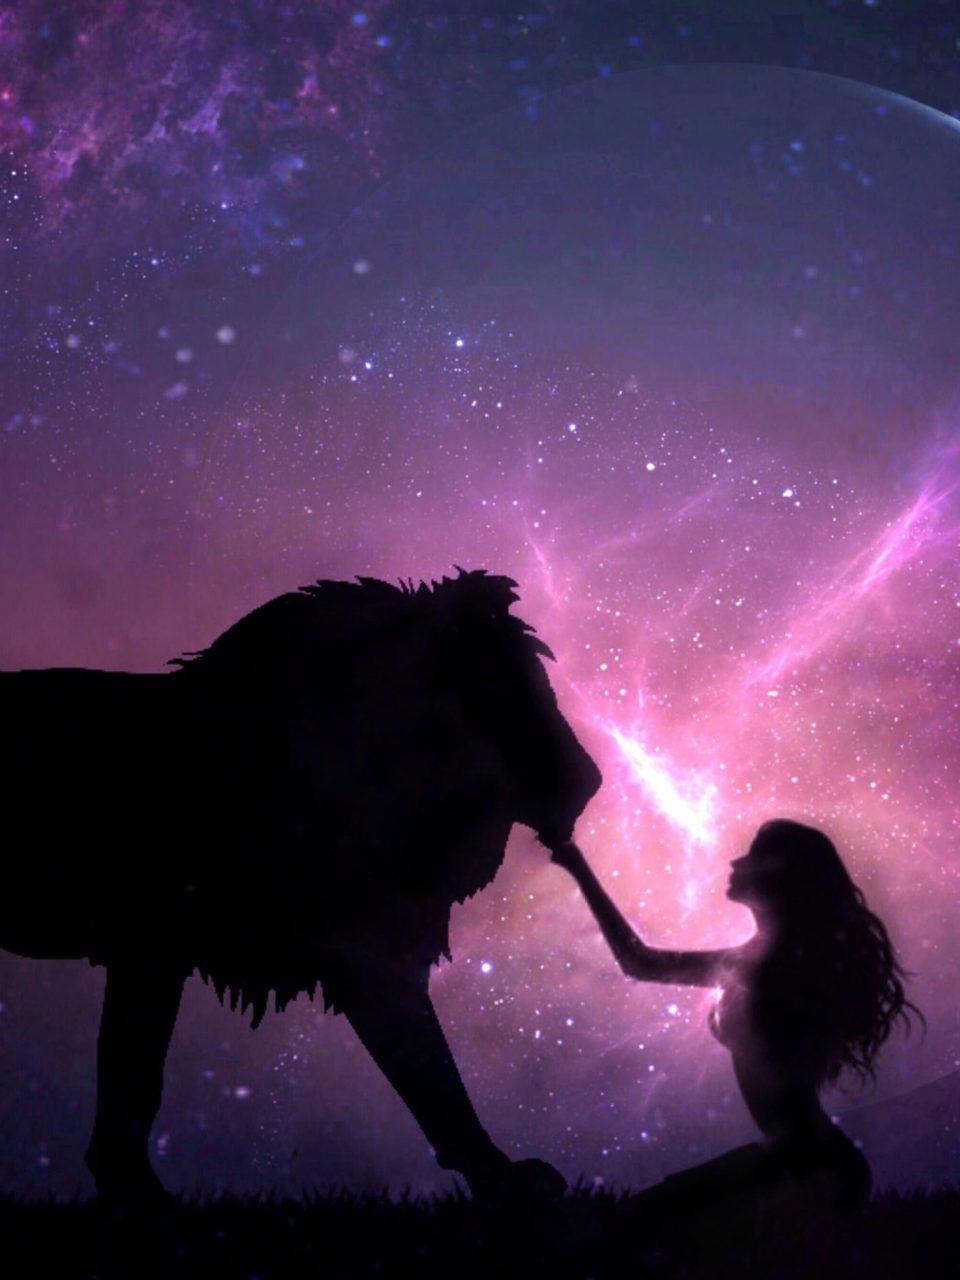 https://astrologelvan.com/wp-content/uploads/2020/08/aslan-yeni-ayı-astrolog-elvan-19-ağustos-burçlar-960x1280.jpg